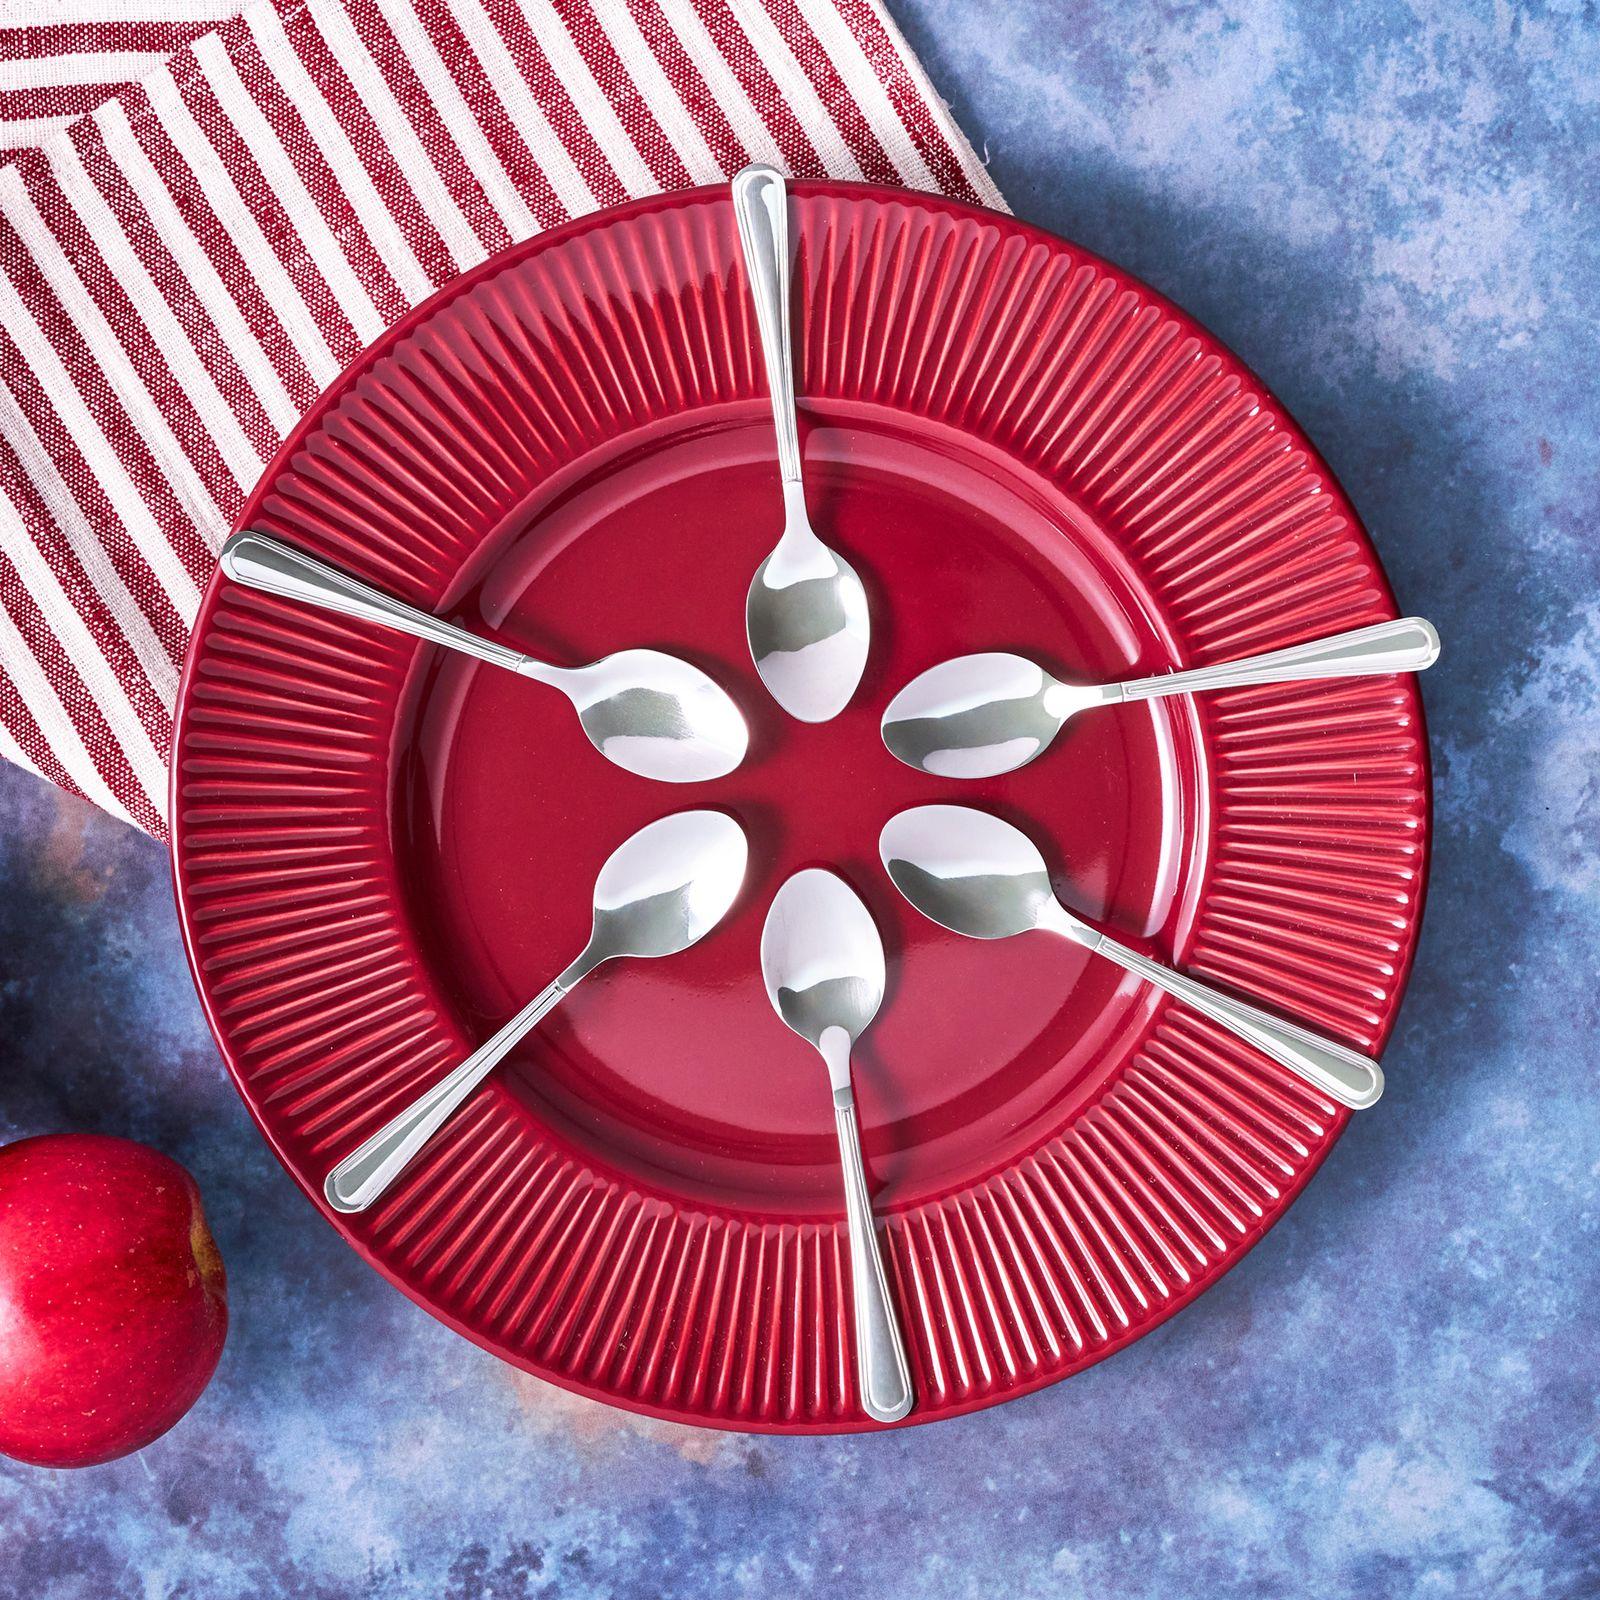 Set of 6 tea spoons Verona 13,8 cm AMBITION